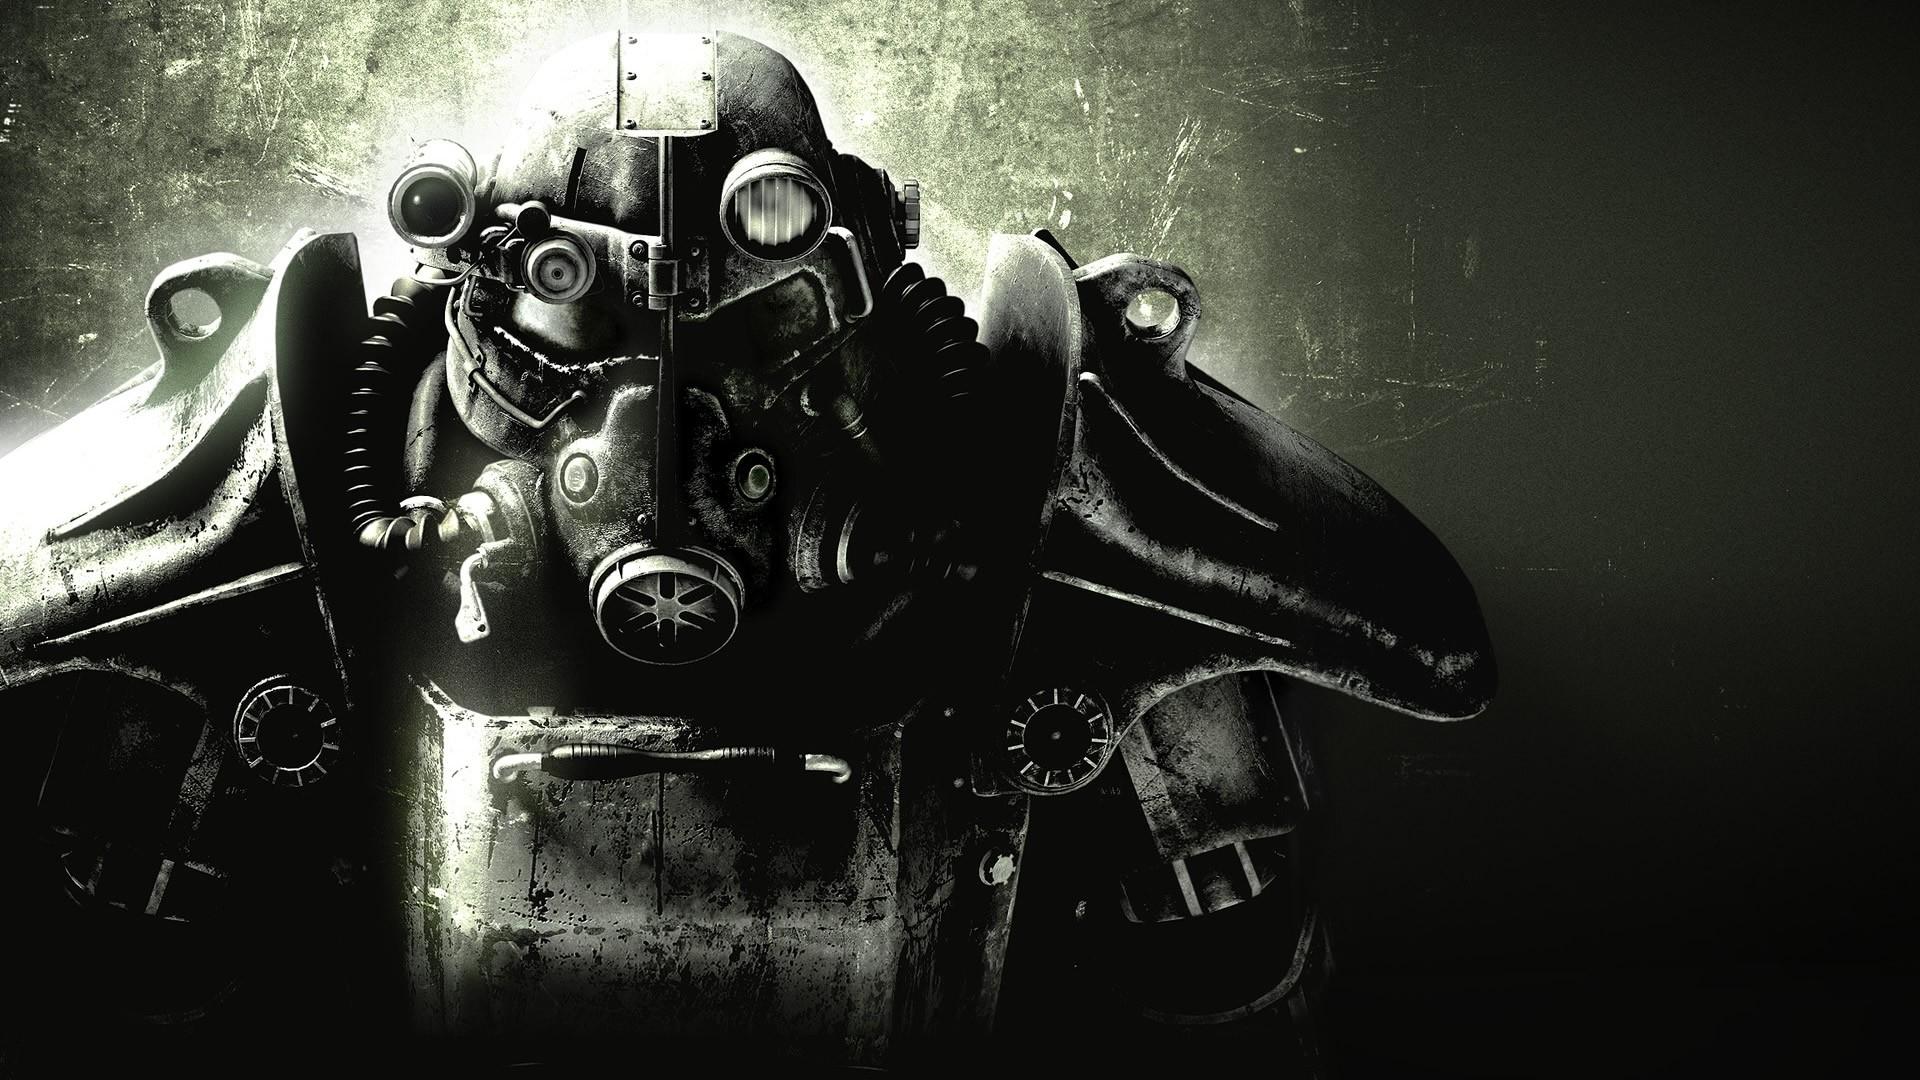 Fallout Fallout Wallpaper Fallout, Fallout, 3